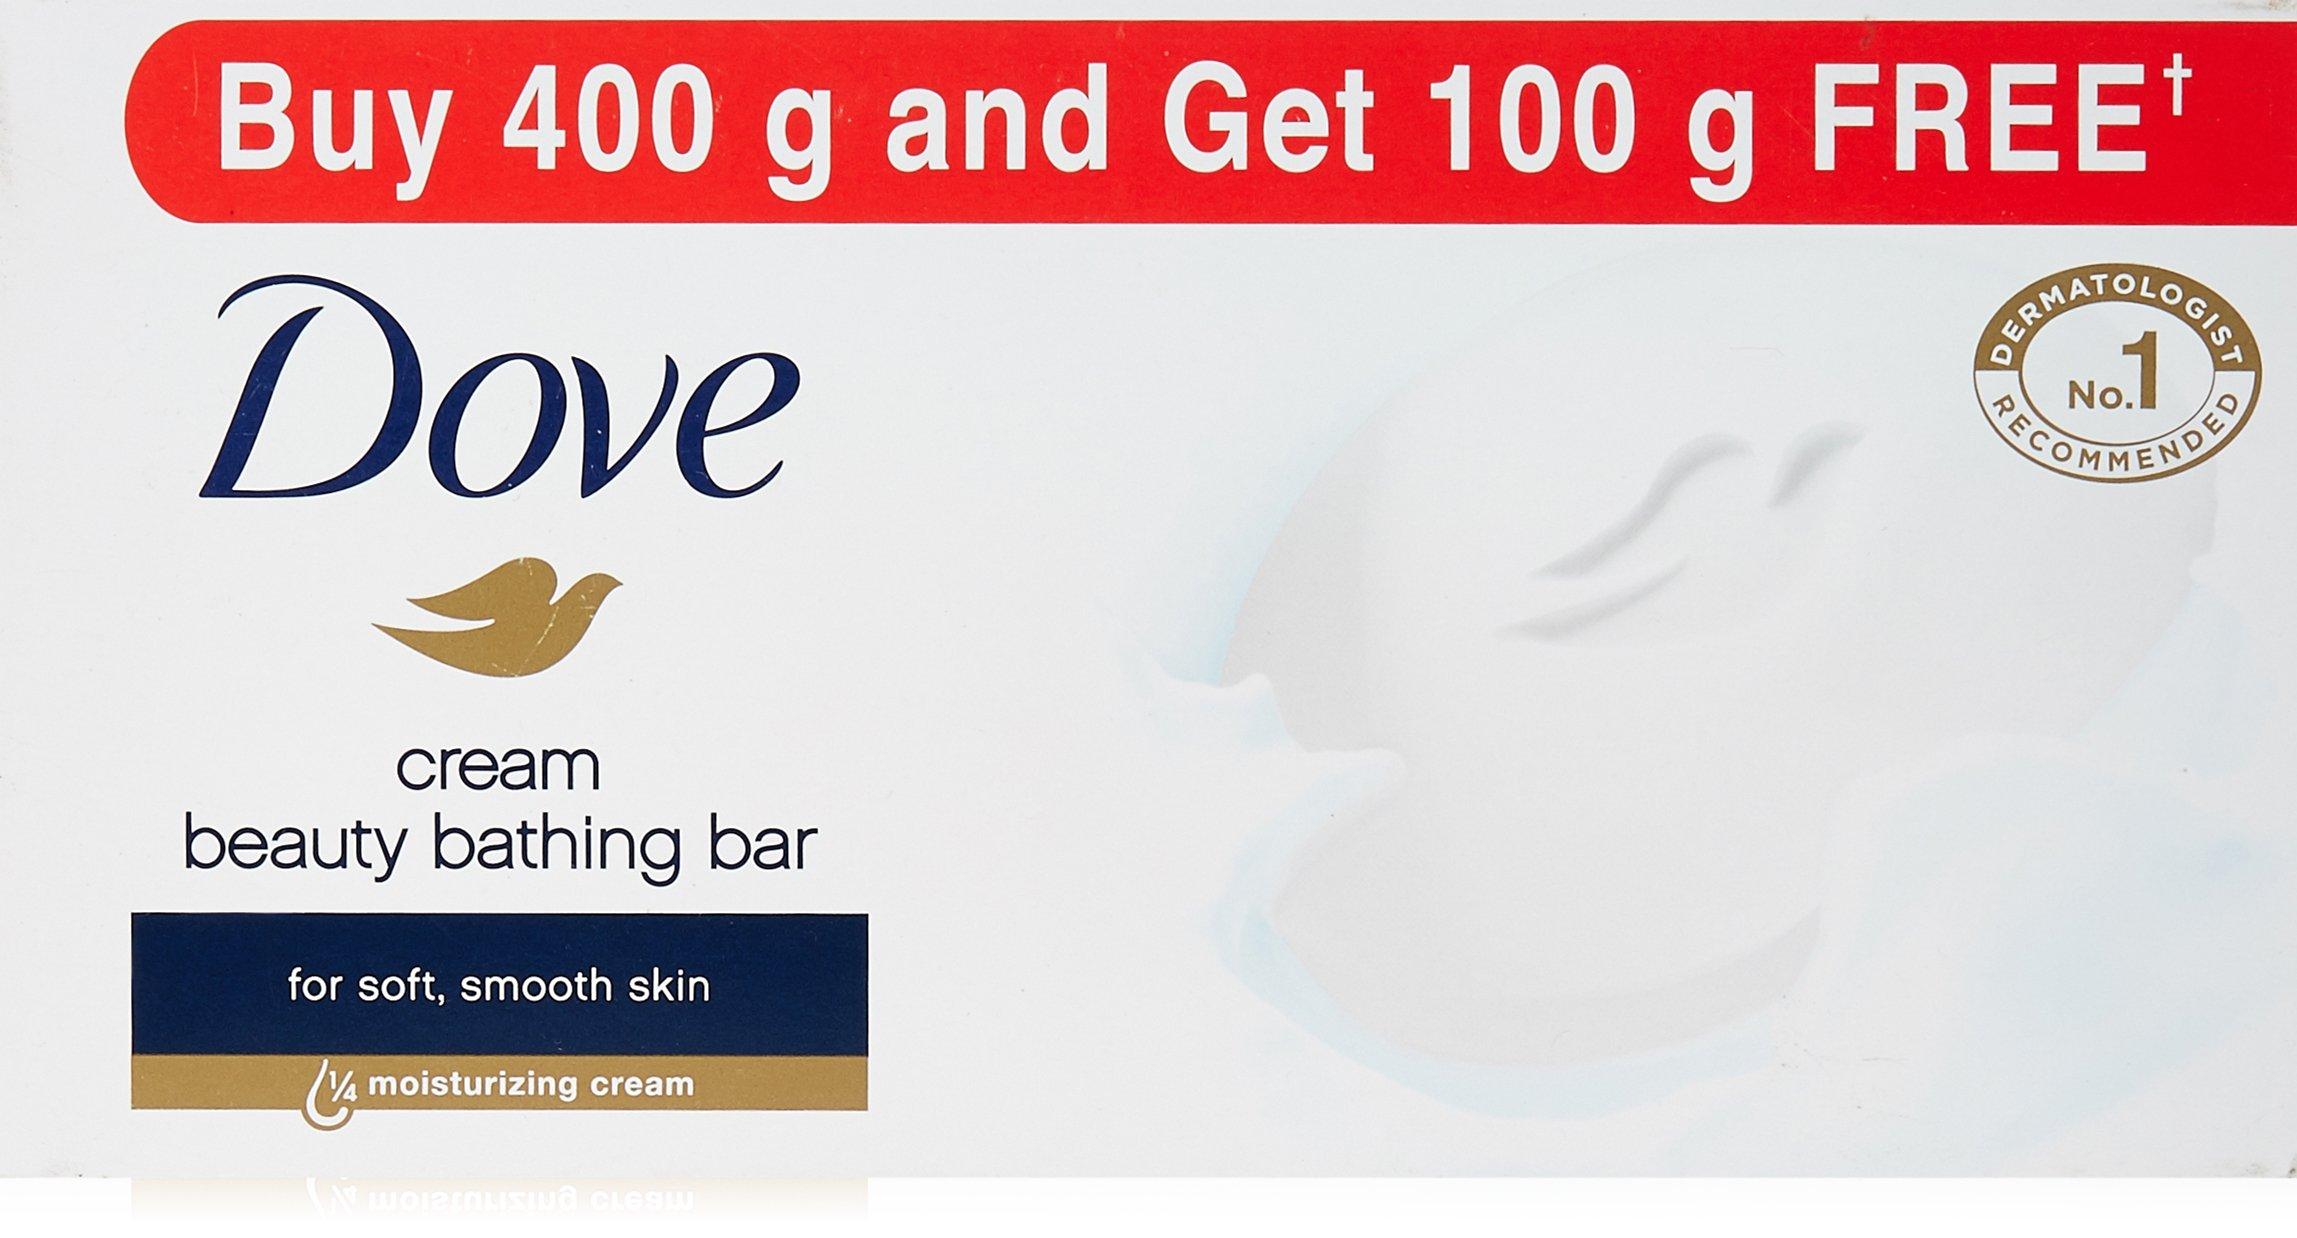 Dove Cream Beauty Bathing Bar, 100g (Buy 4 Get 1 Free) product image